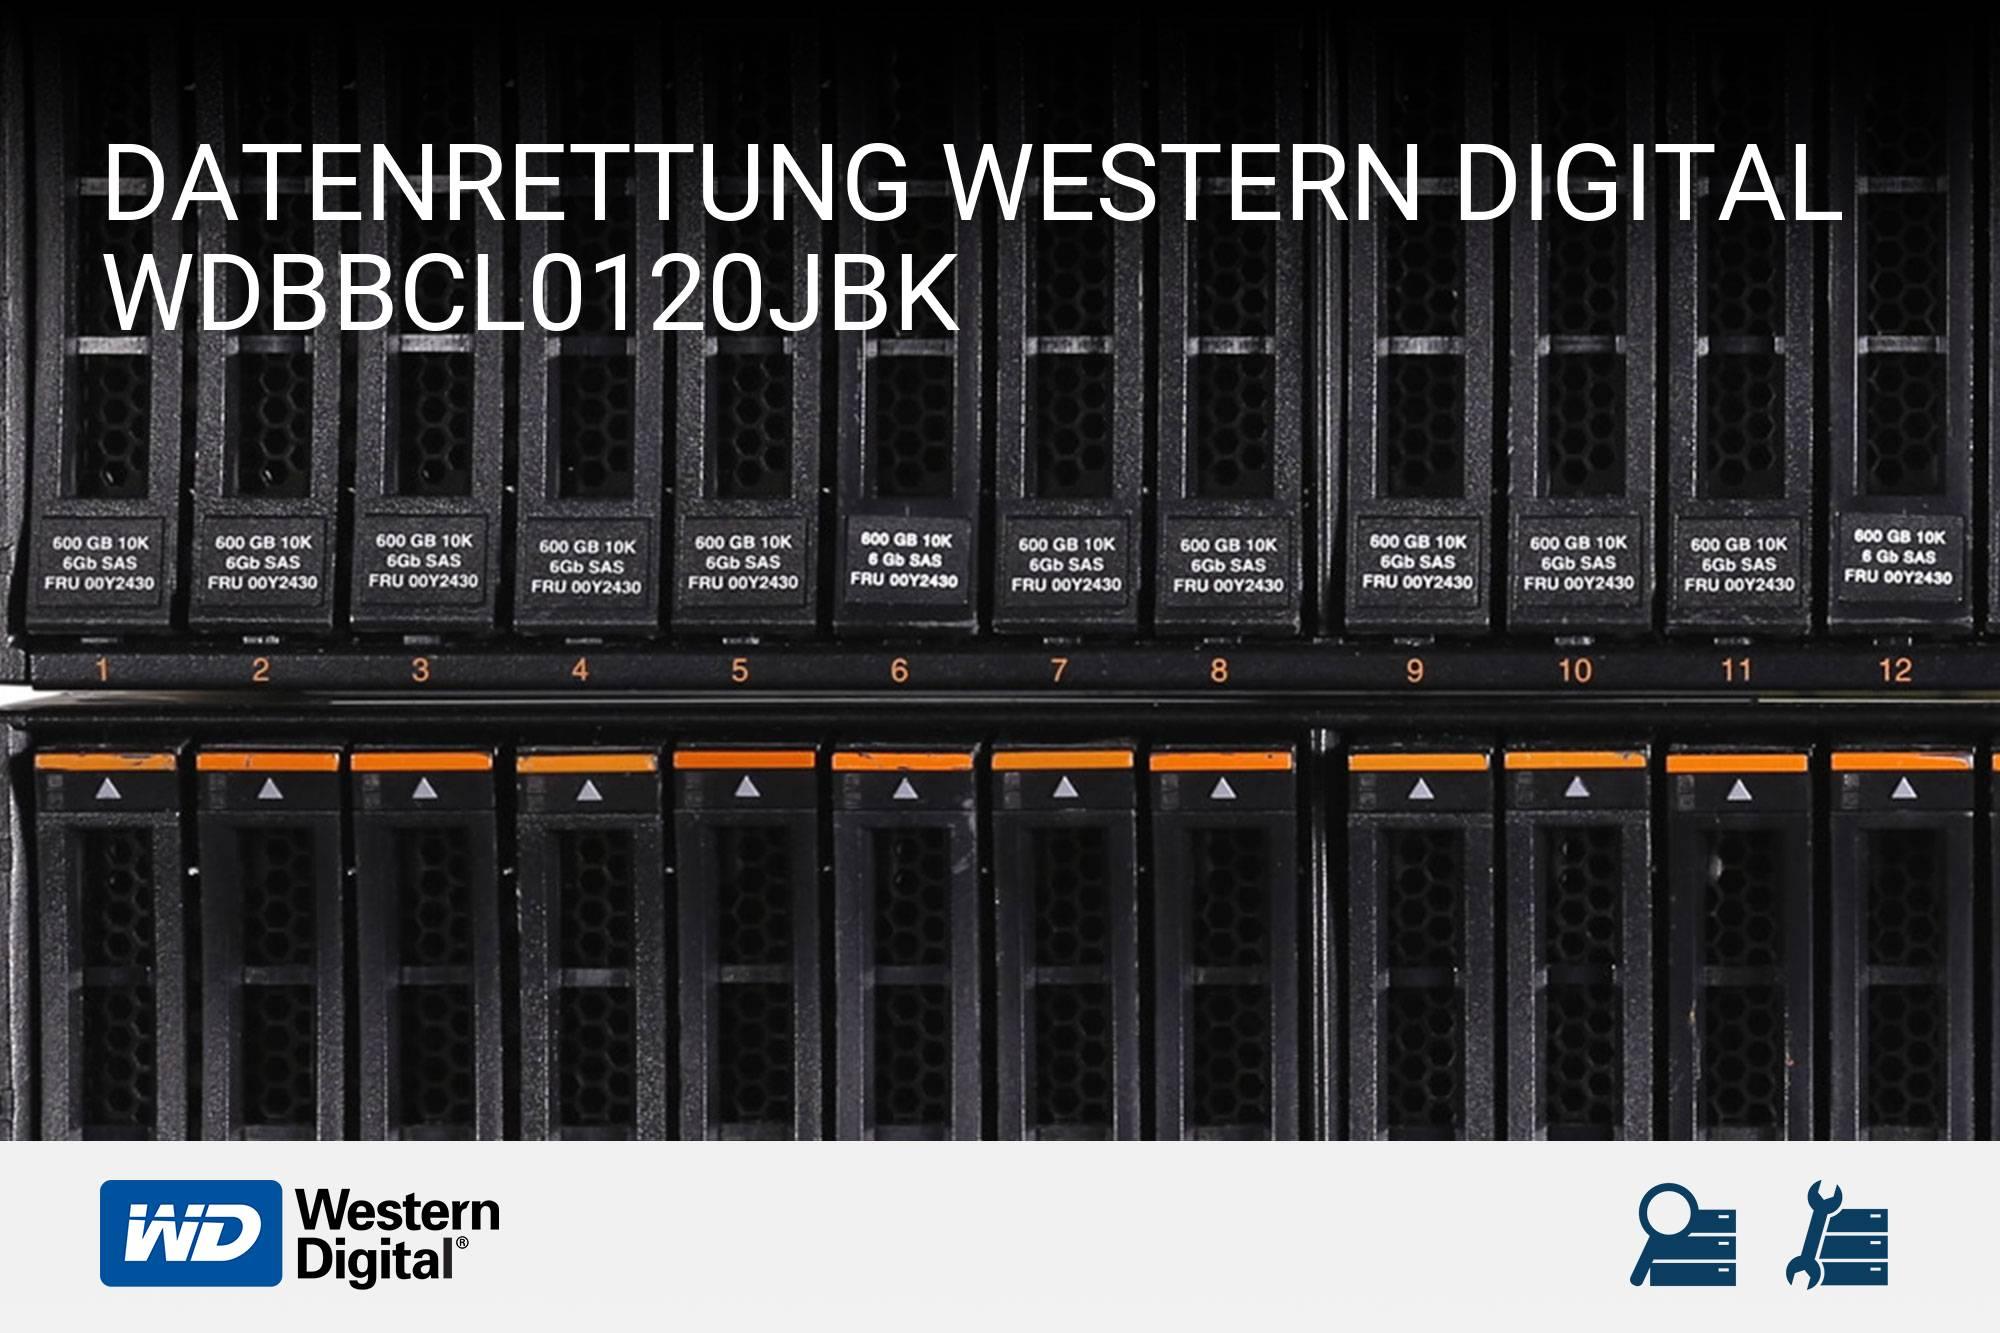 Western Digital WDBBCL0120JBK